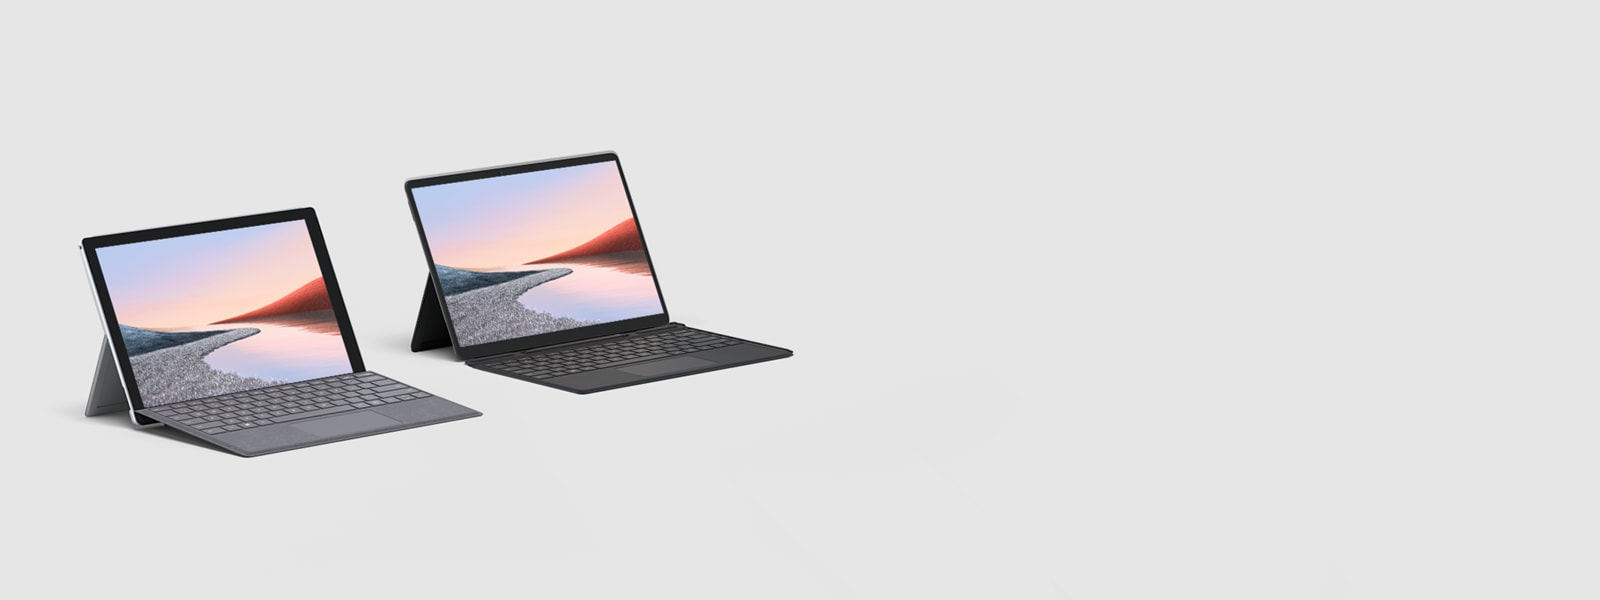 Surface Pro 7 in Platinum with Platinum Type Cover and Surface Pro X with Black Type Cover